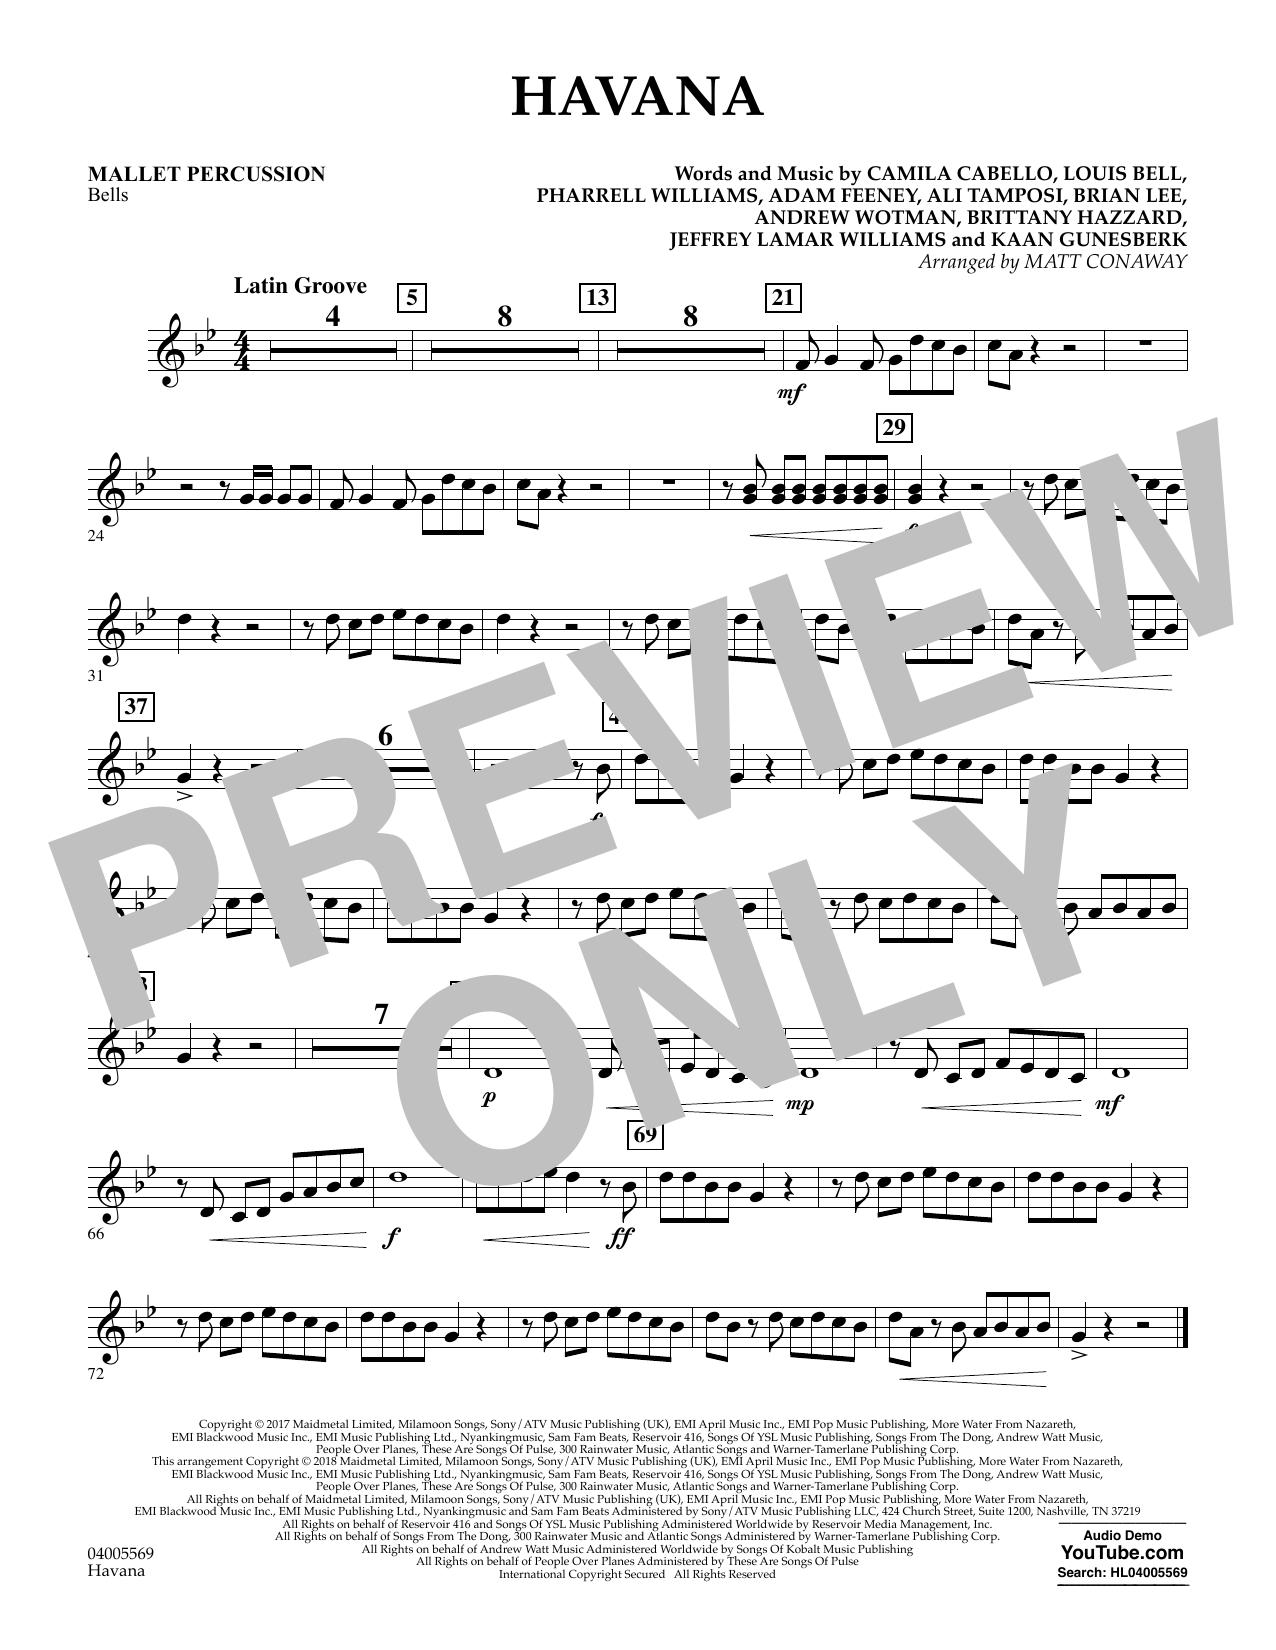 Havana - Mallet Percussion (Concert Band)